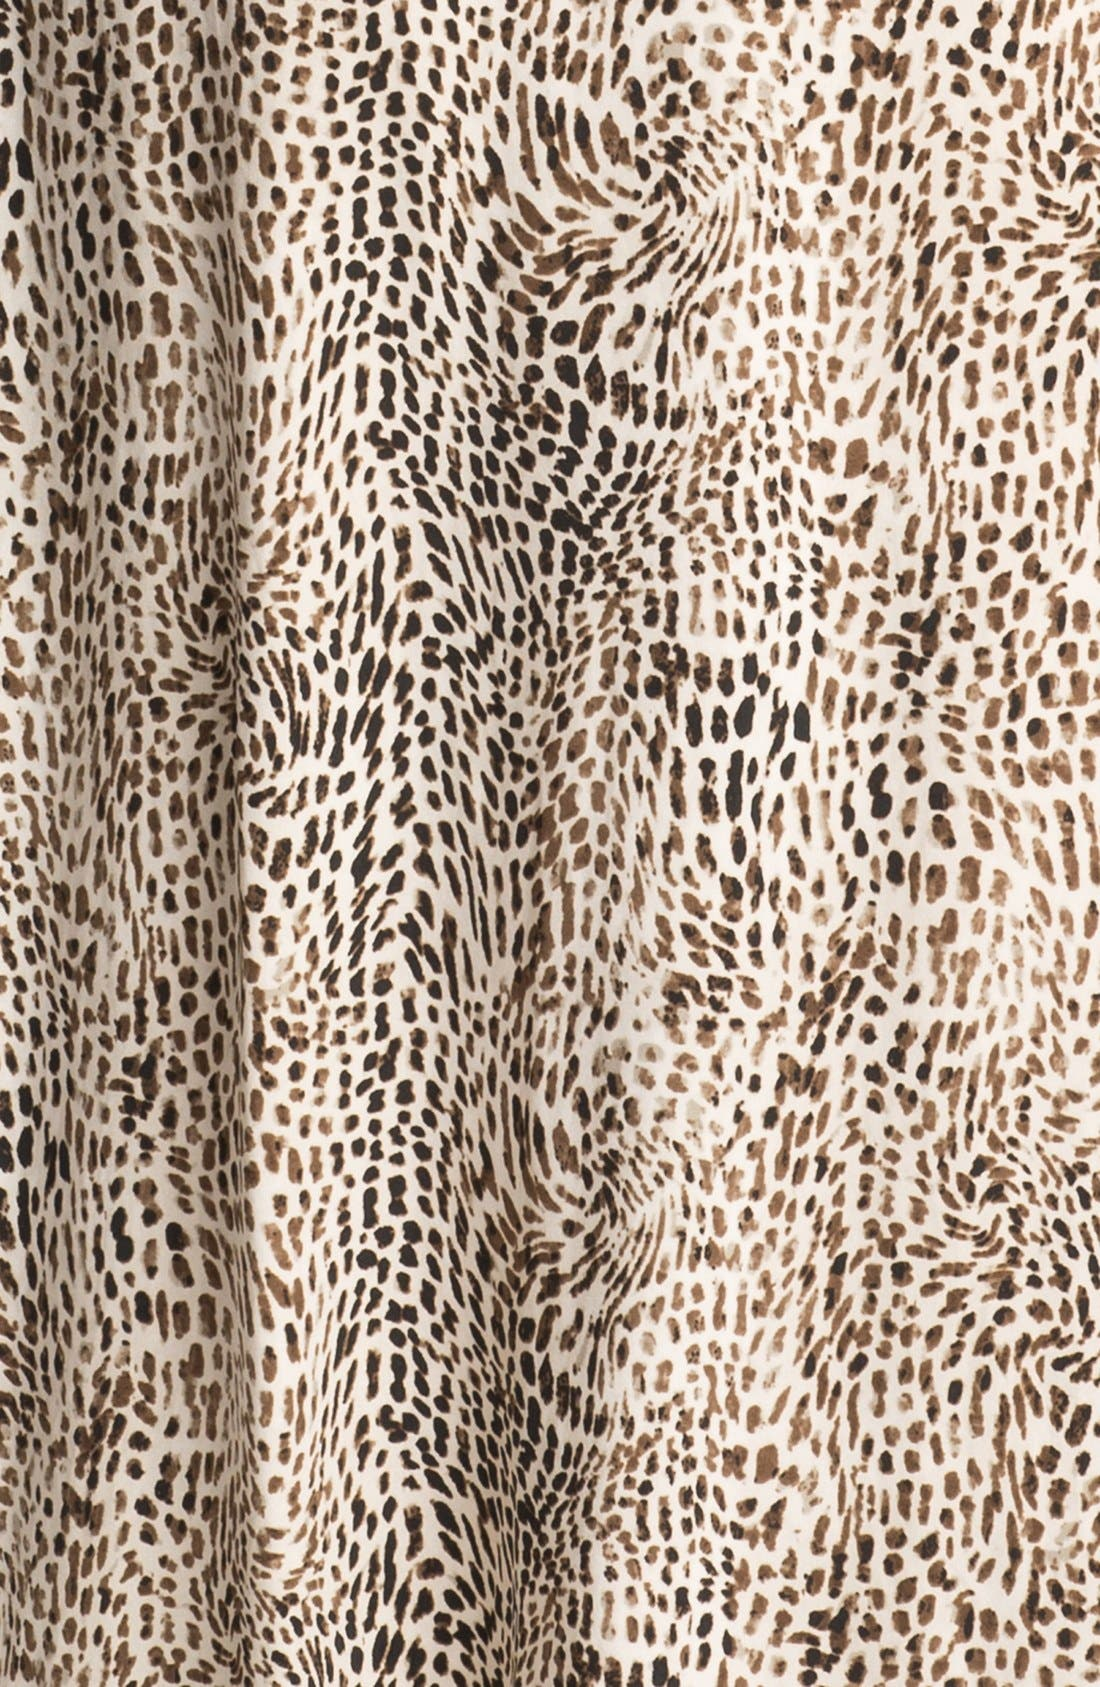 'Rio' Cheetah Print Maxi Dress,                             Alternate thumbnail 3, color,                             271